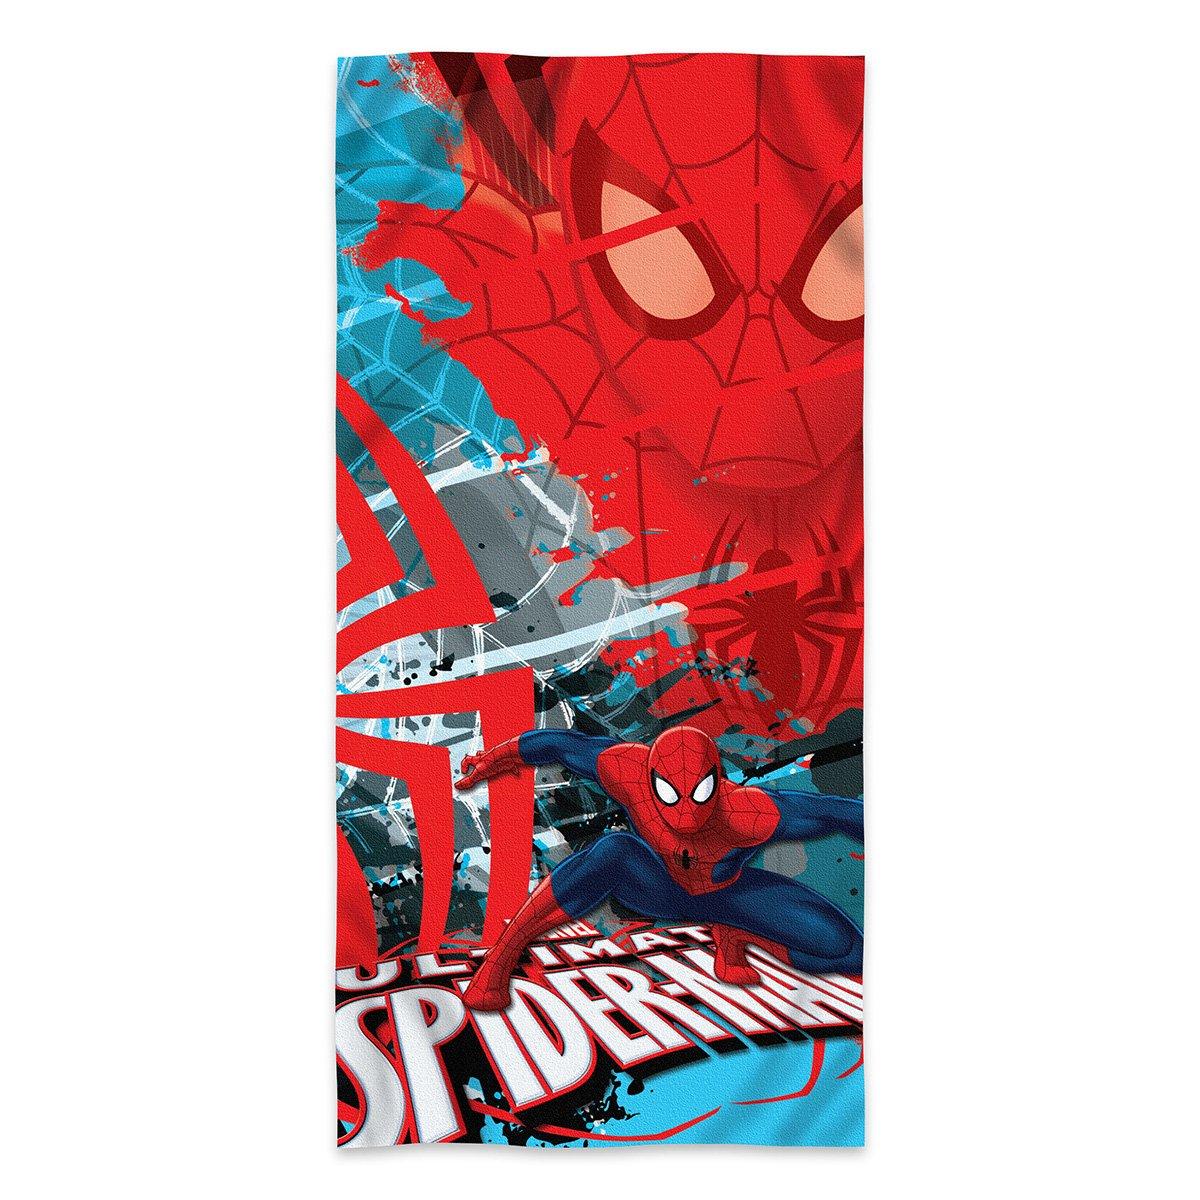 S.L Home Designs Disney Marvel Comics Ultimate Spiderman Super Spy Fiber Reactive Cotton Beach Towel 30x60 Inches